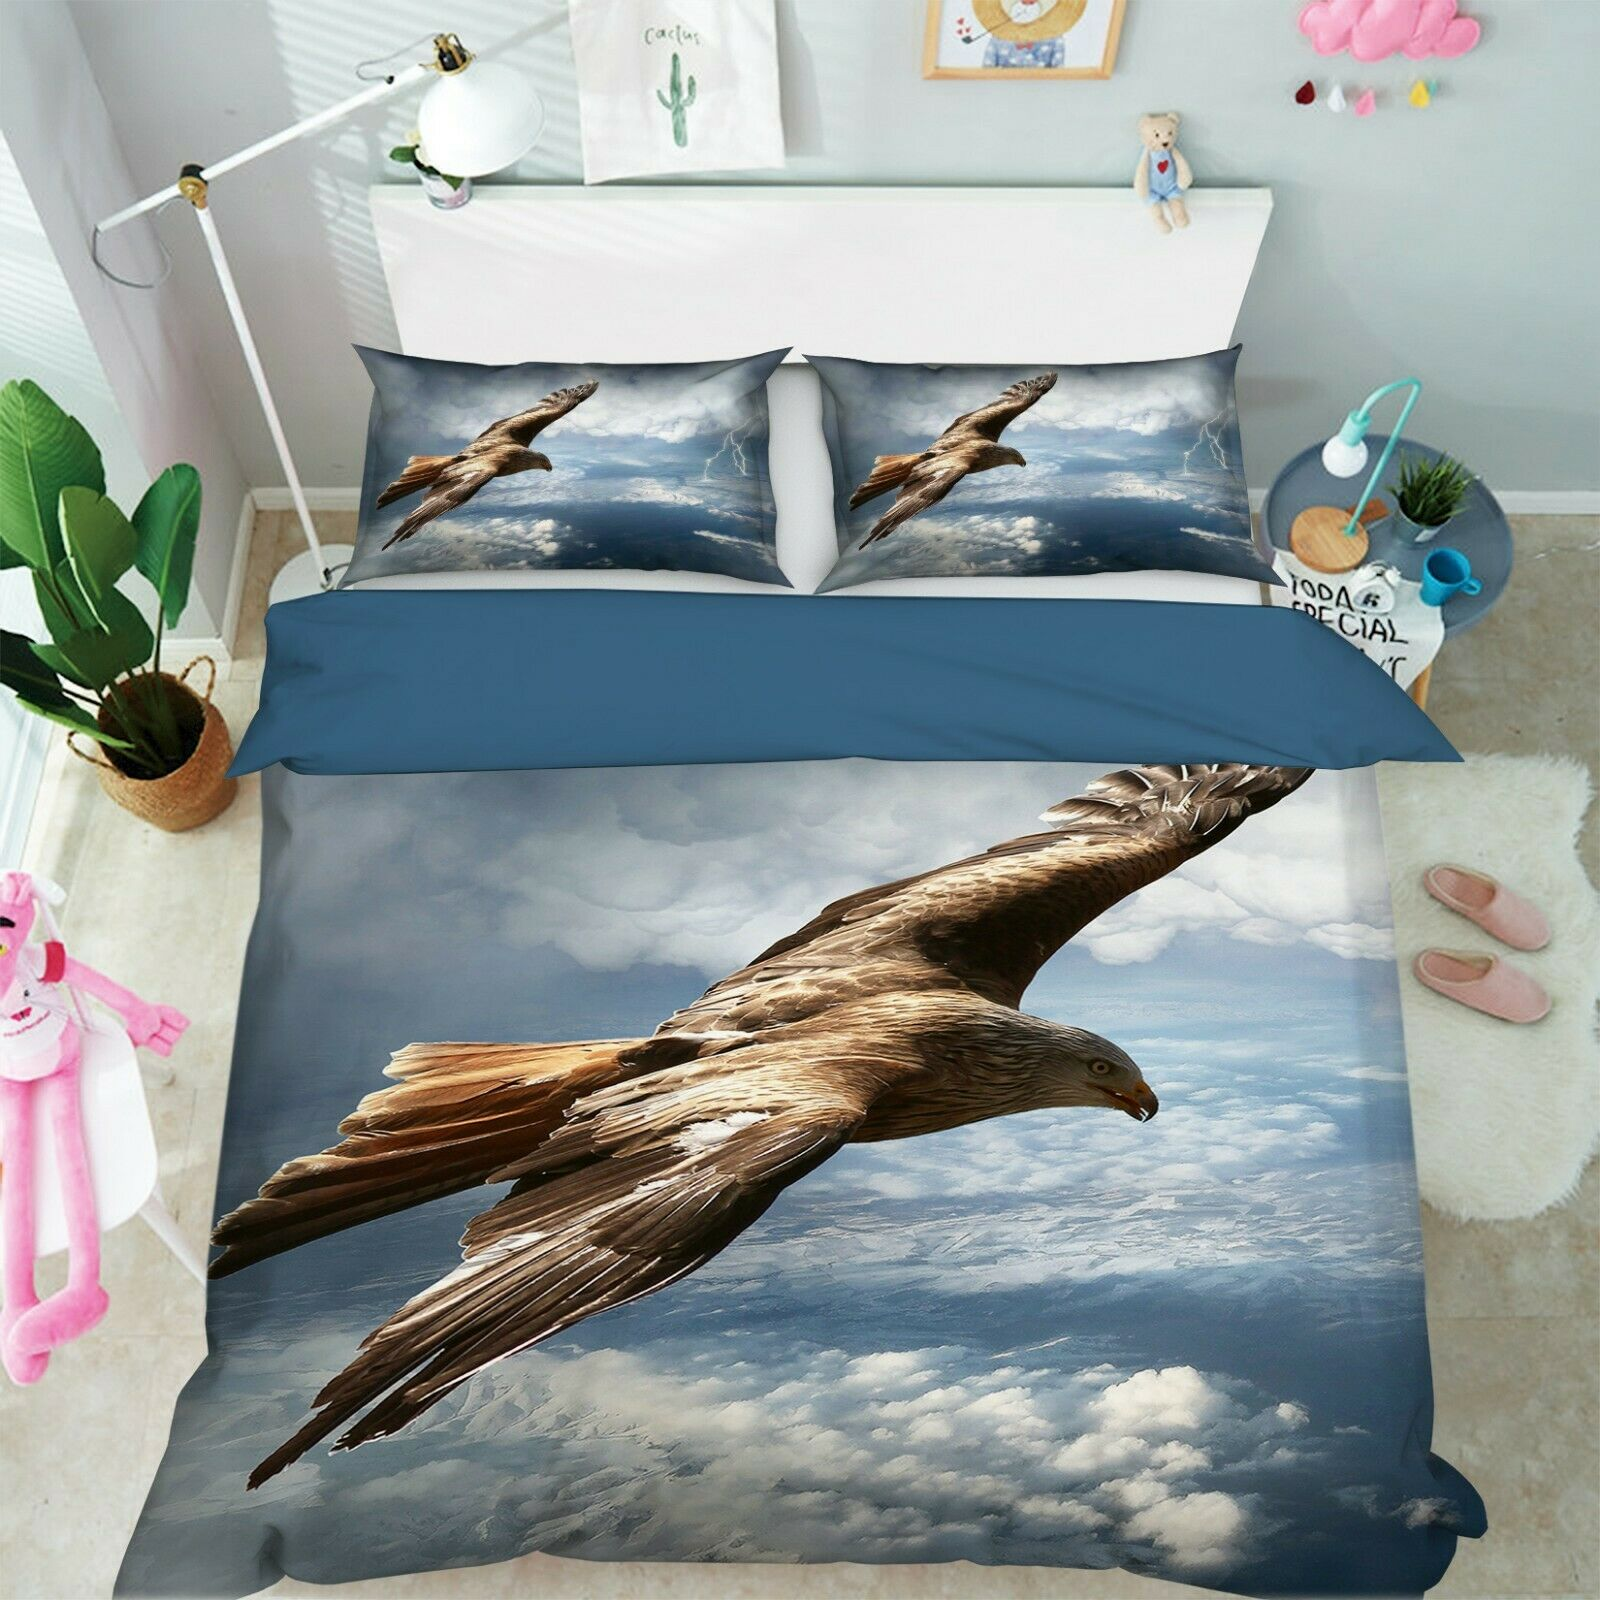 3D Eagle Flying Sky I24 Animal Bett Pillowcases Quilt Duvet Startseite Königin König An